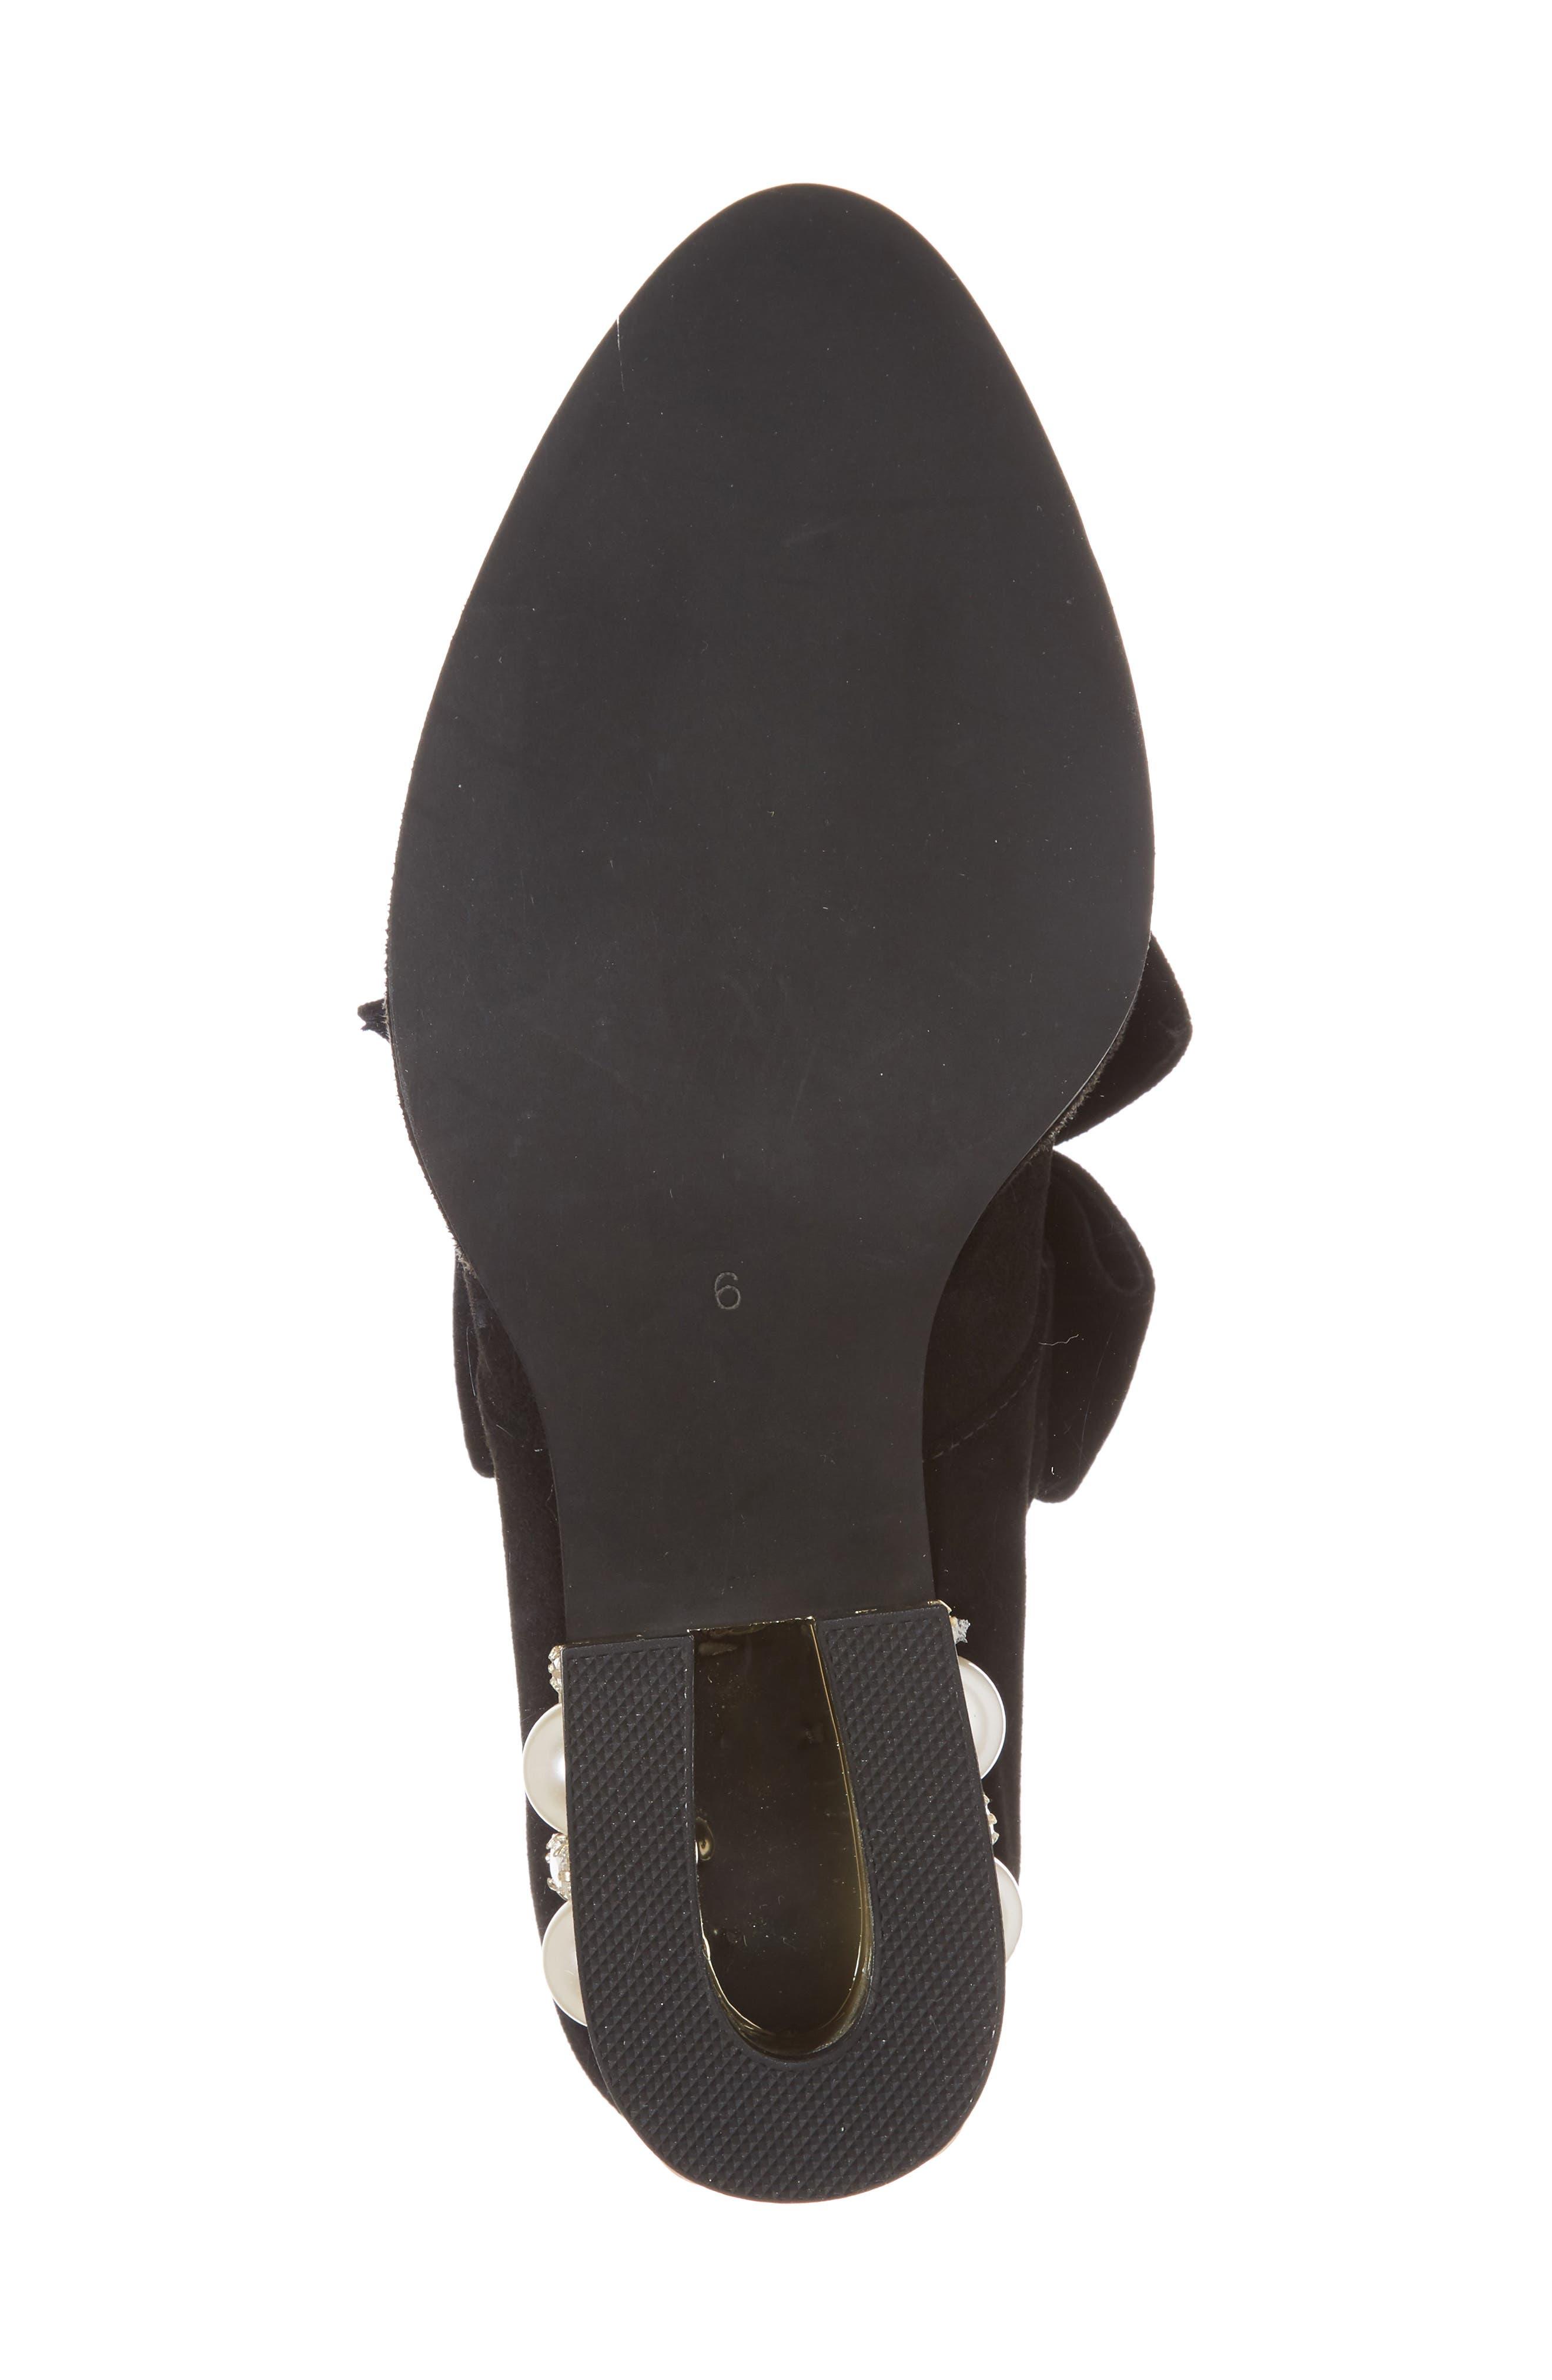 Cordene Embellished Bow Pump,                             Alternate thumbnail 6, color,                             Black/ Gold Suede